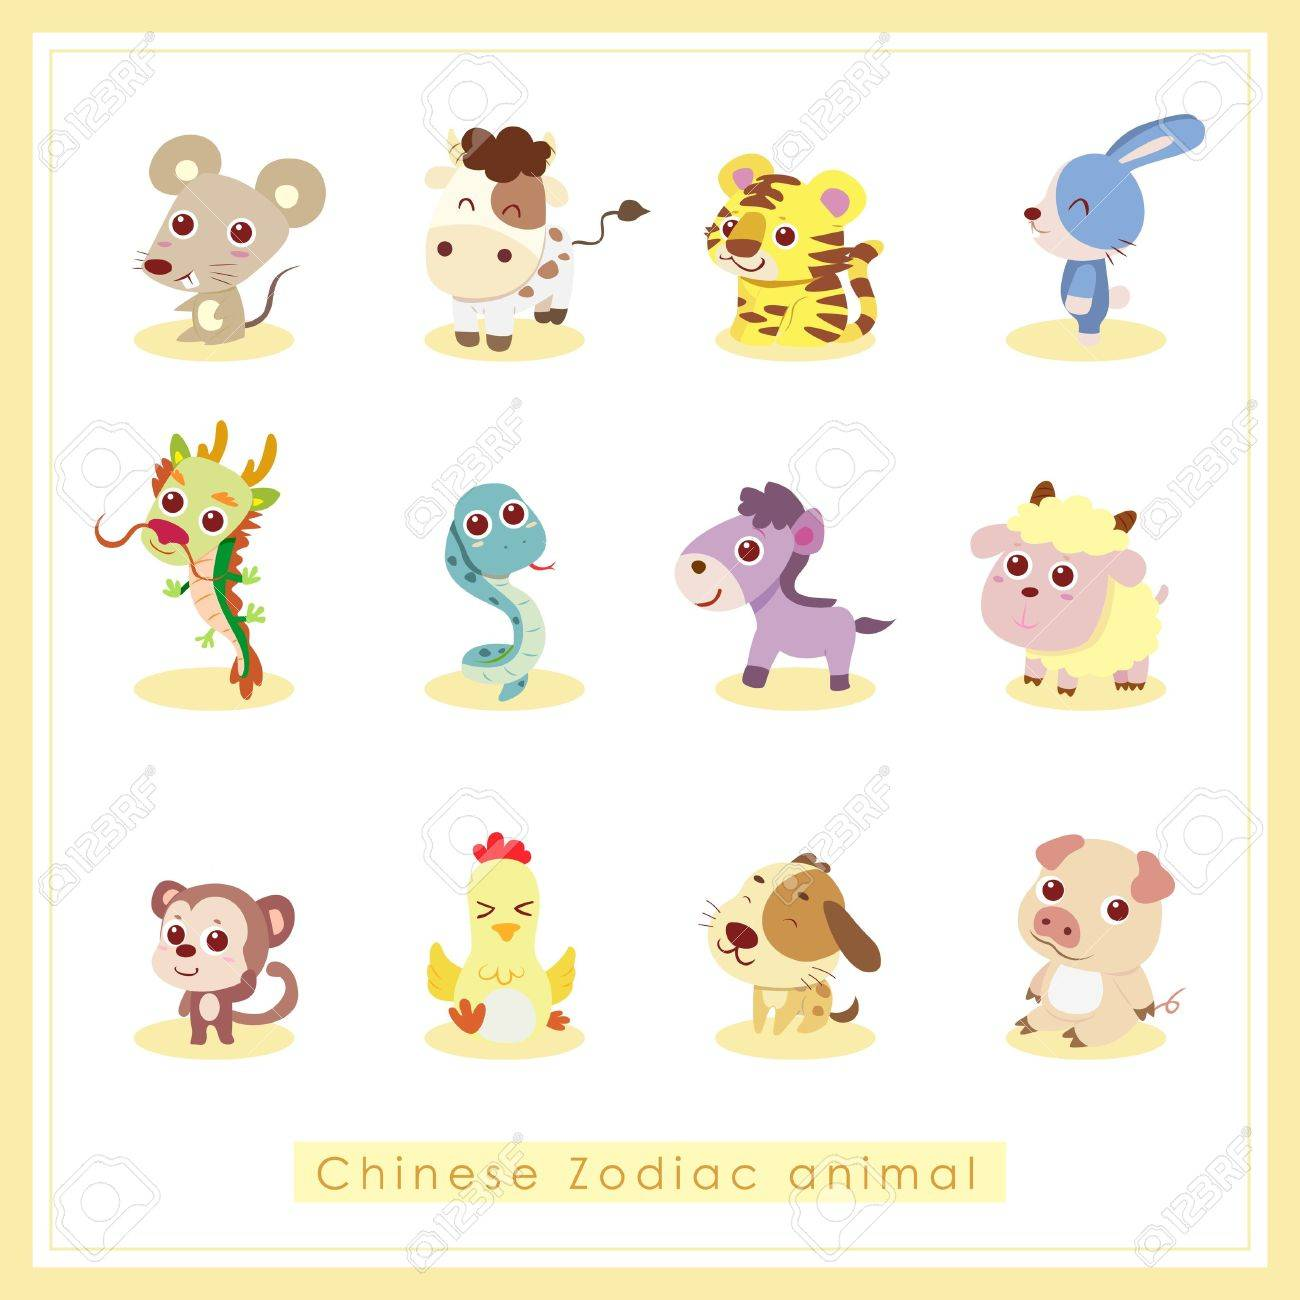 12 Chinese Zodiac animal stickers,cartoon vector illustration Stock Vector - 17017033